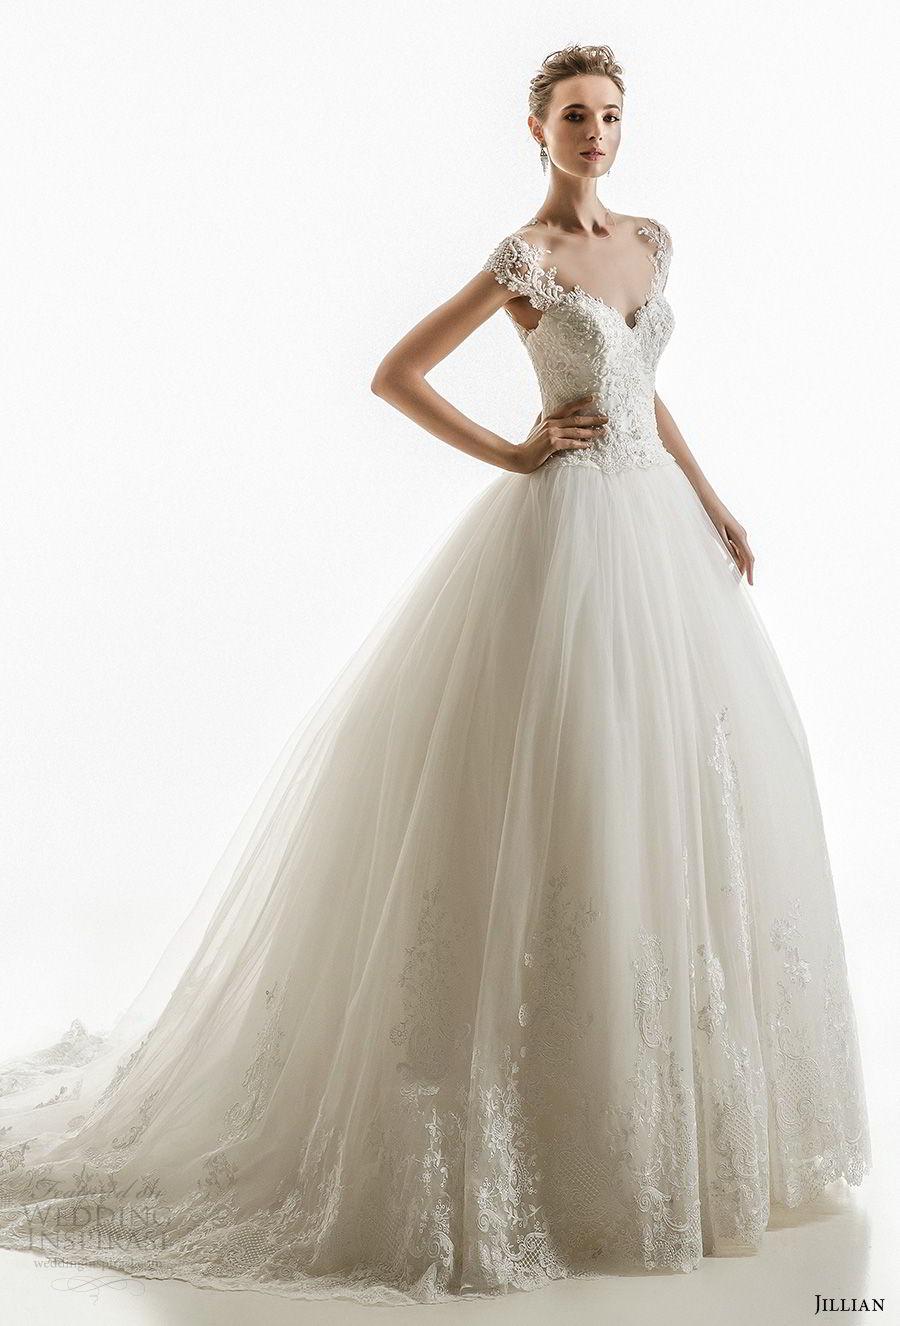 jillian 2018 bridal cap sleeves illusion jewel sweetheart neckline heavily embellished princess ball gown wedding dress sheer lace back chapel train (17) mv